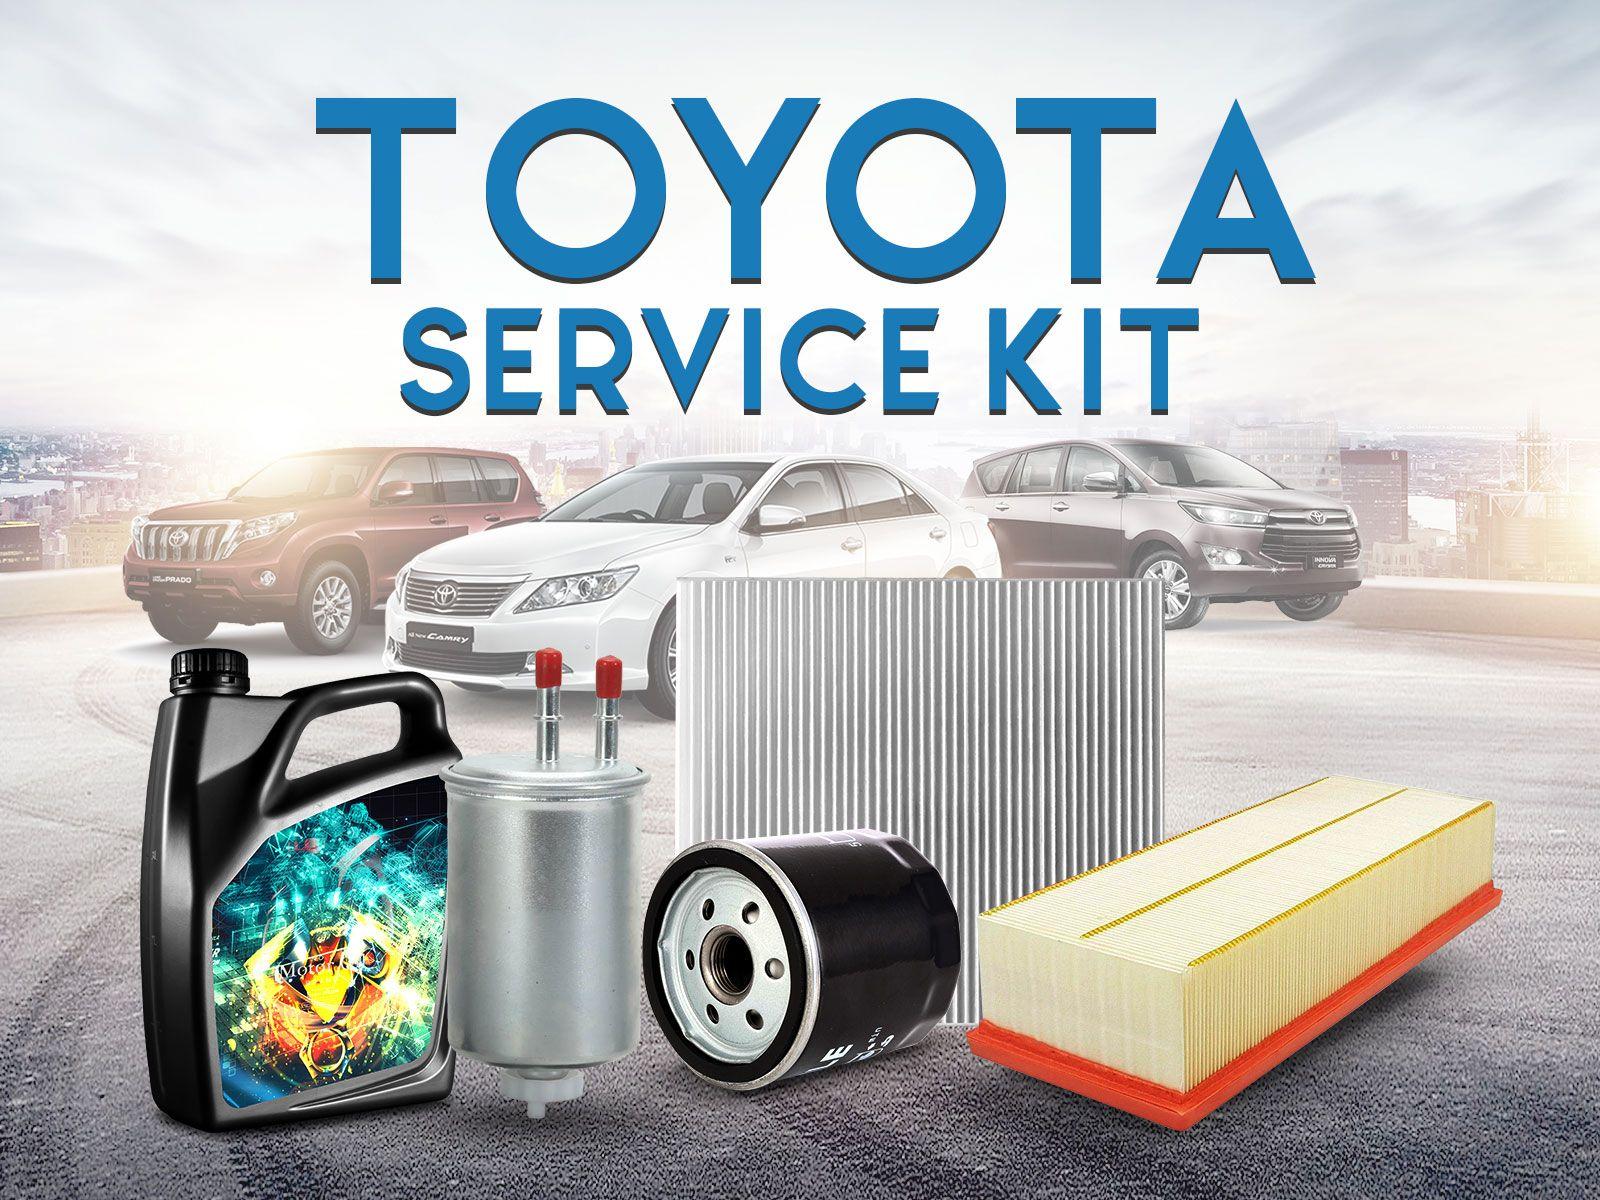 Toyota Car Service Kit Honda service, Service kits, Toyota